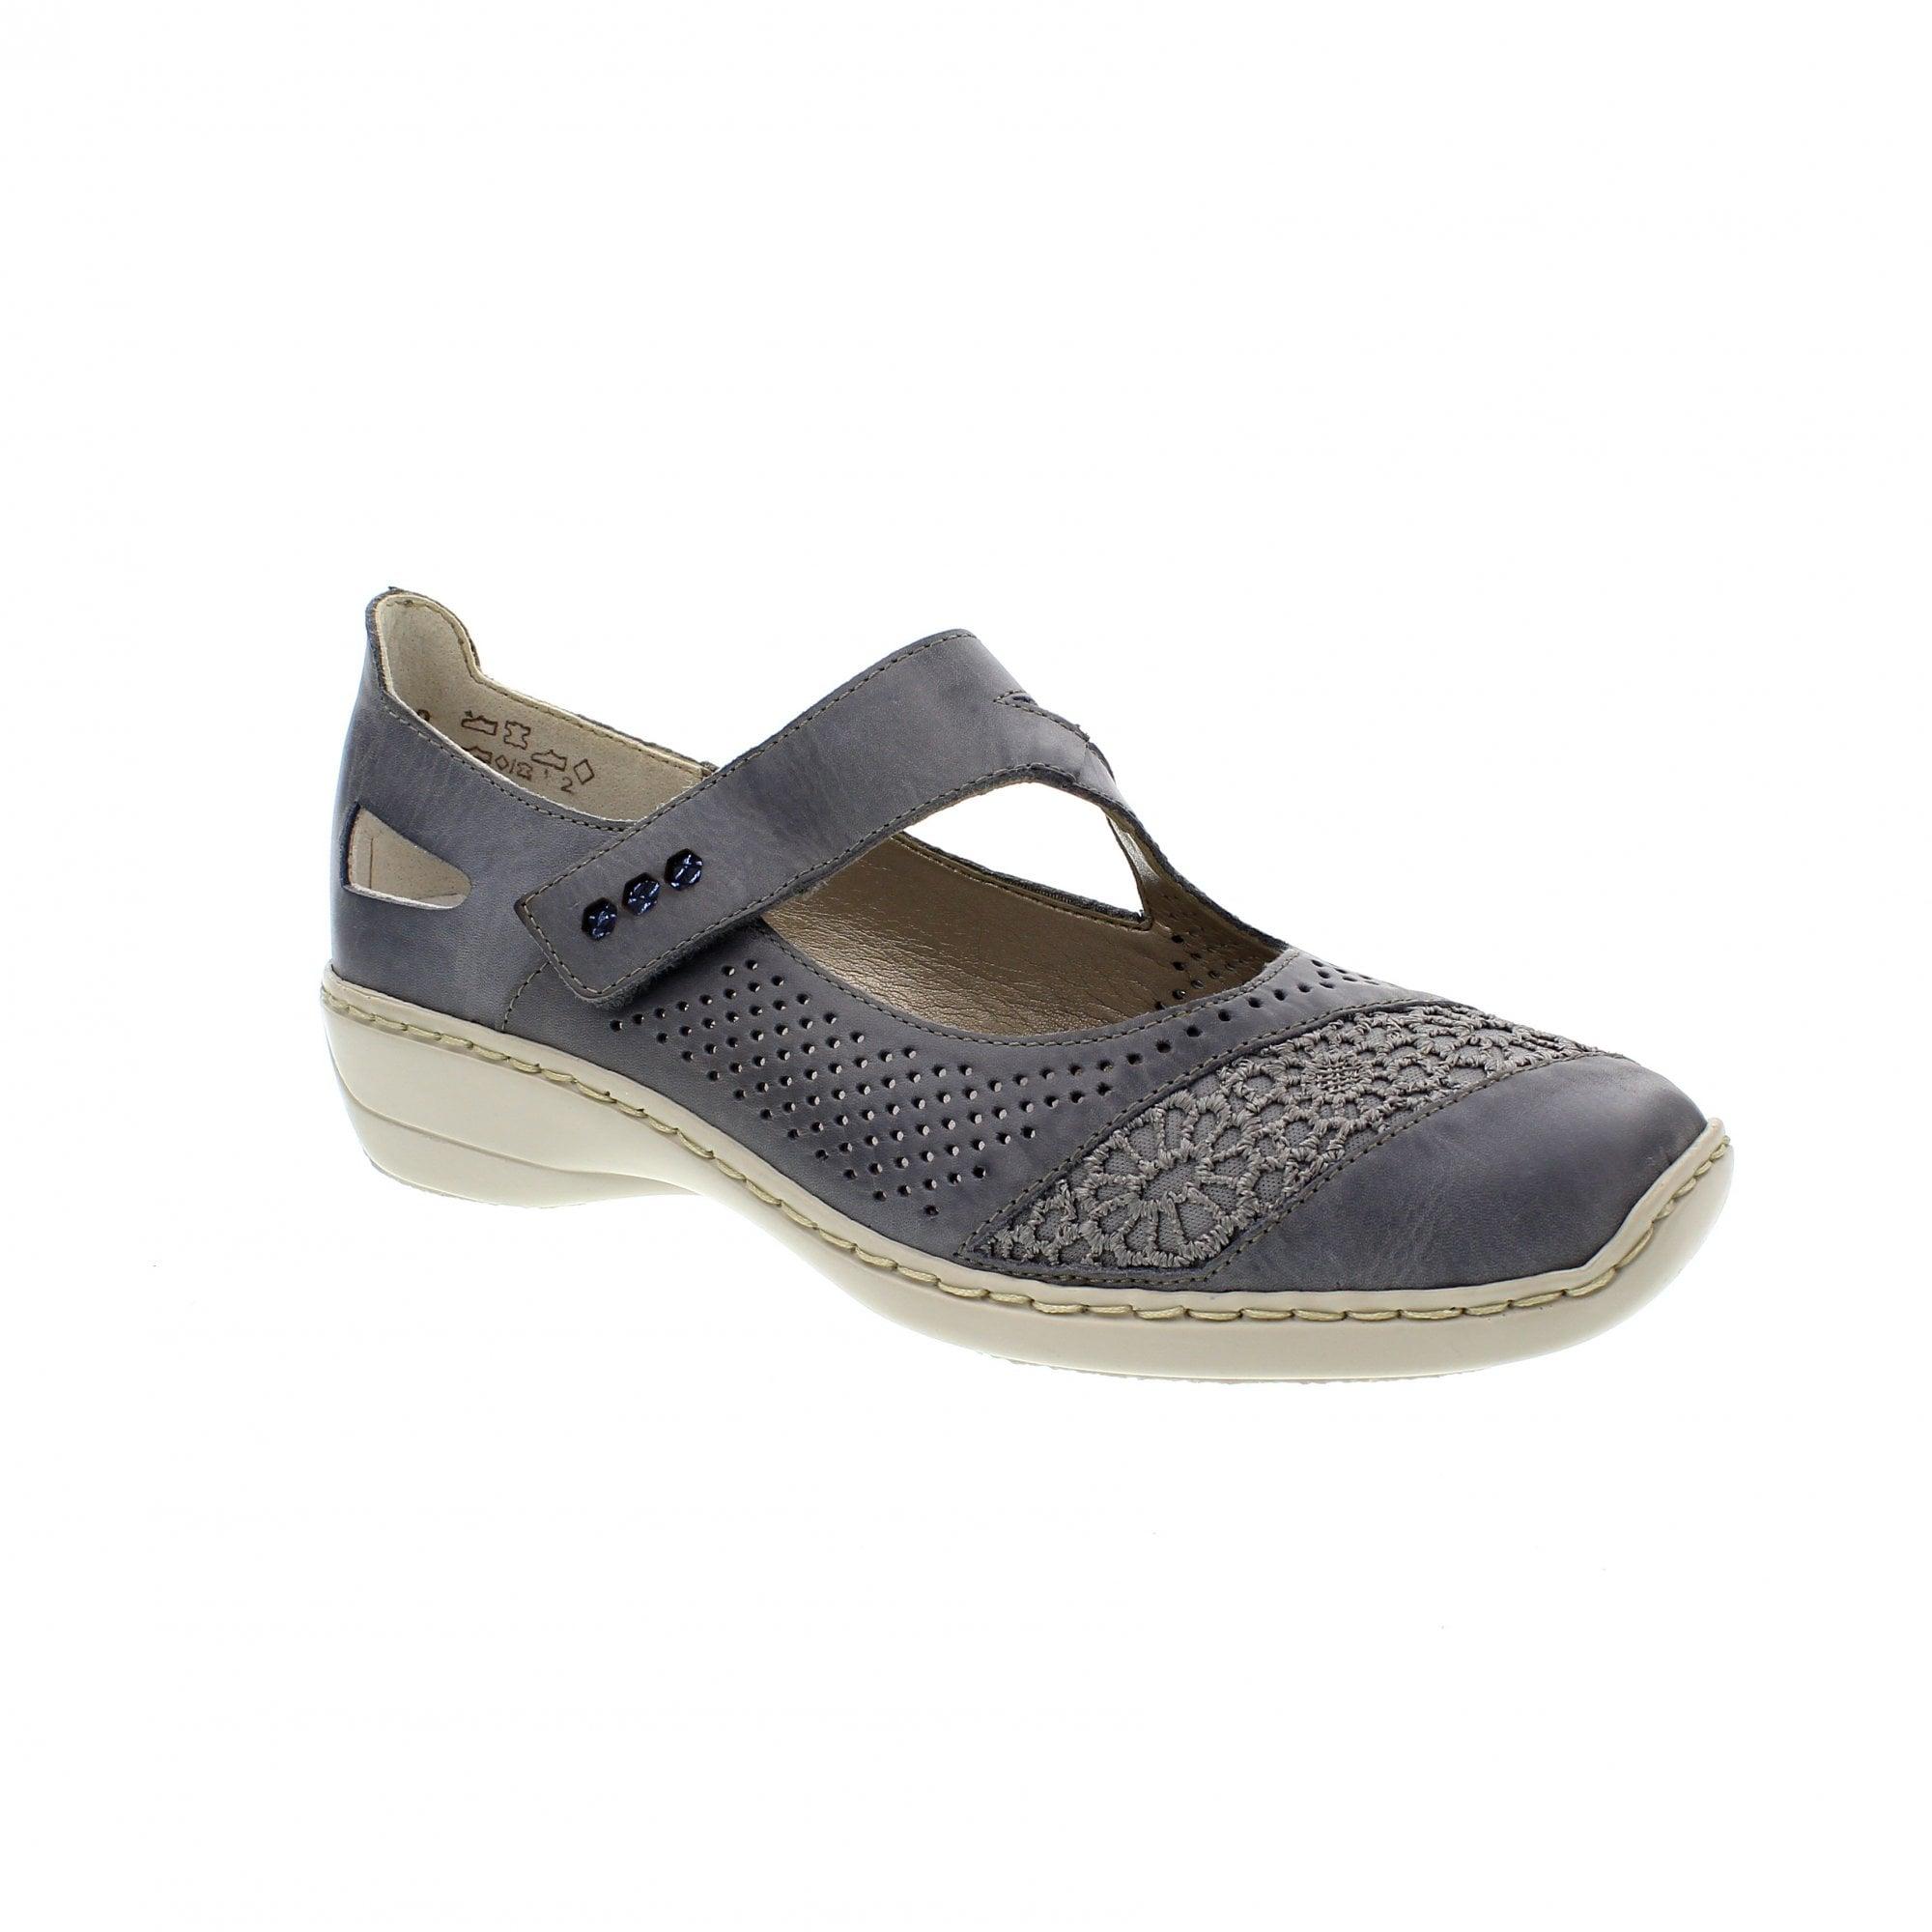 99c00796ed Rieker 41346-12 Denim Leather Womens Mary Jane Bar Shoes